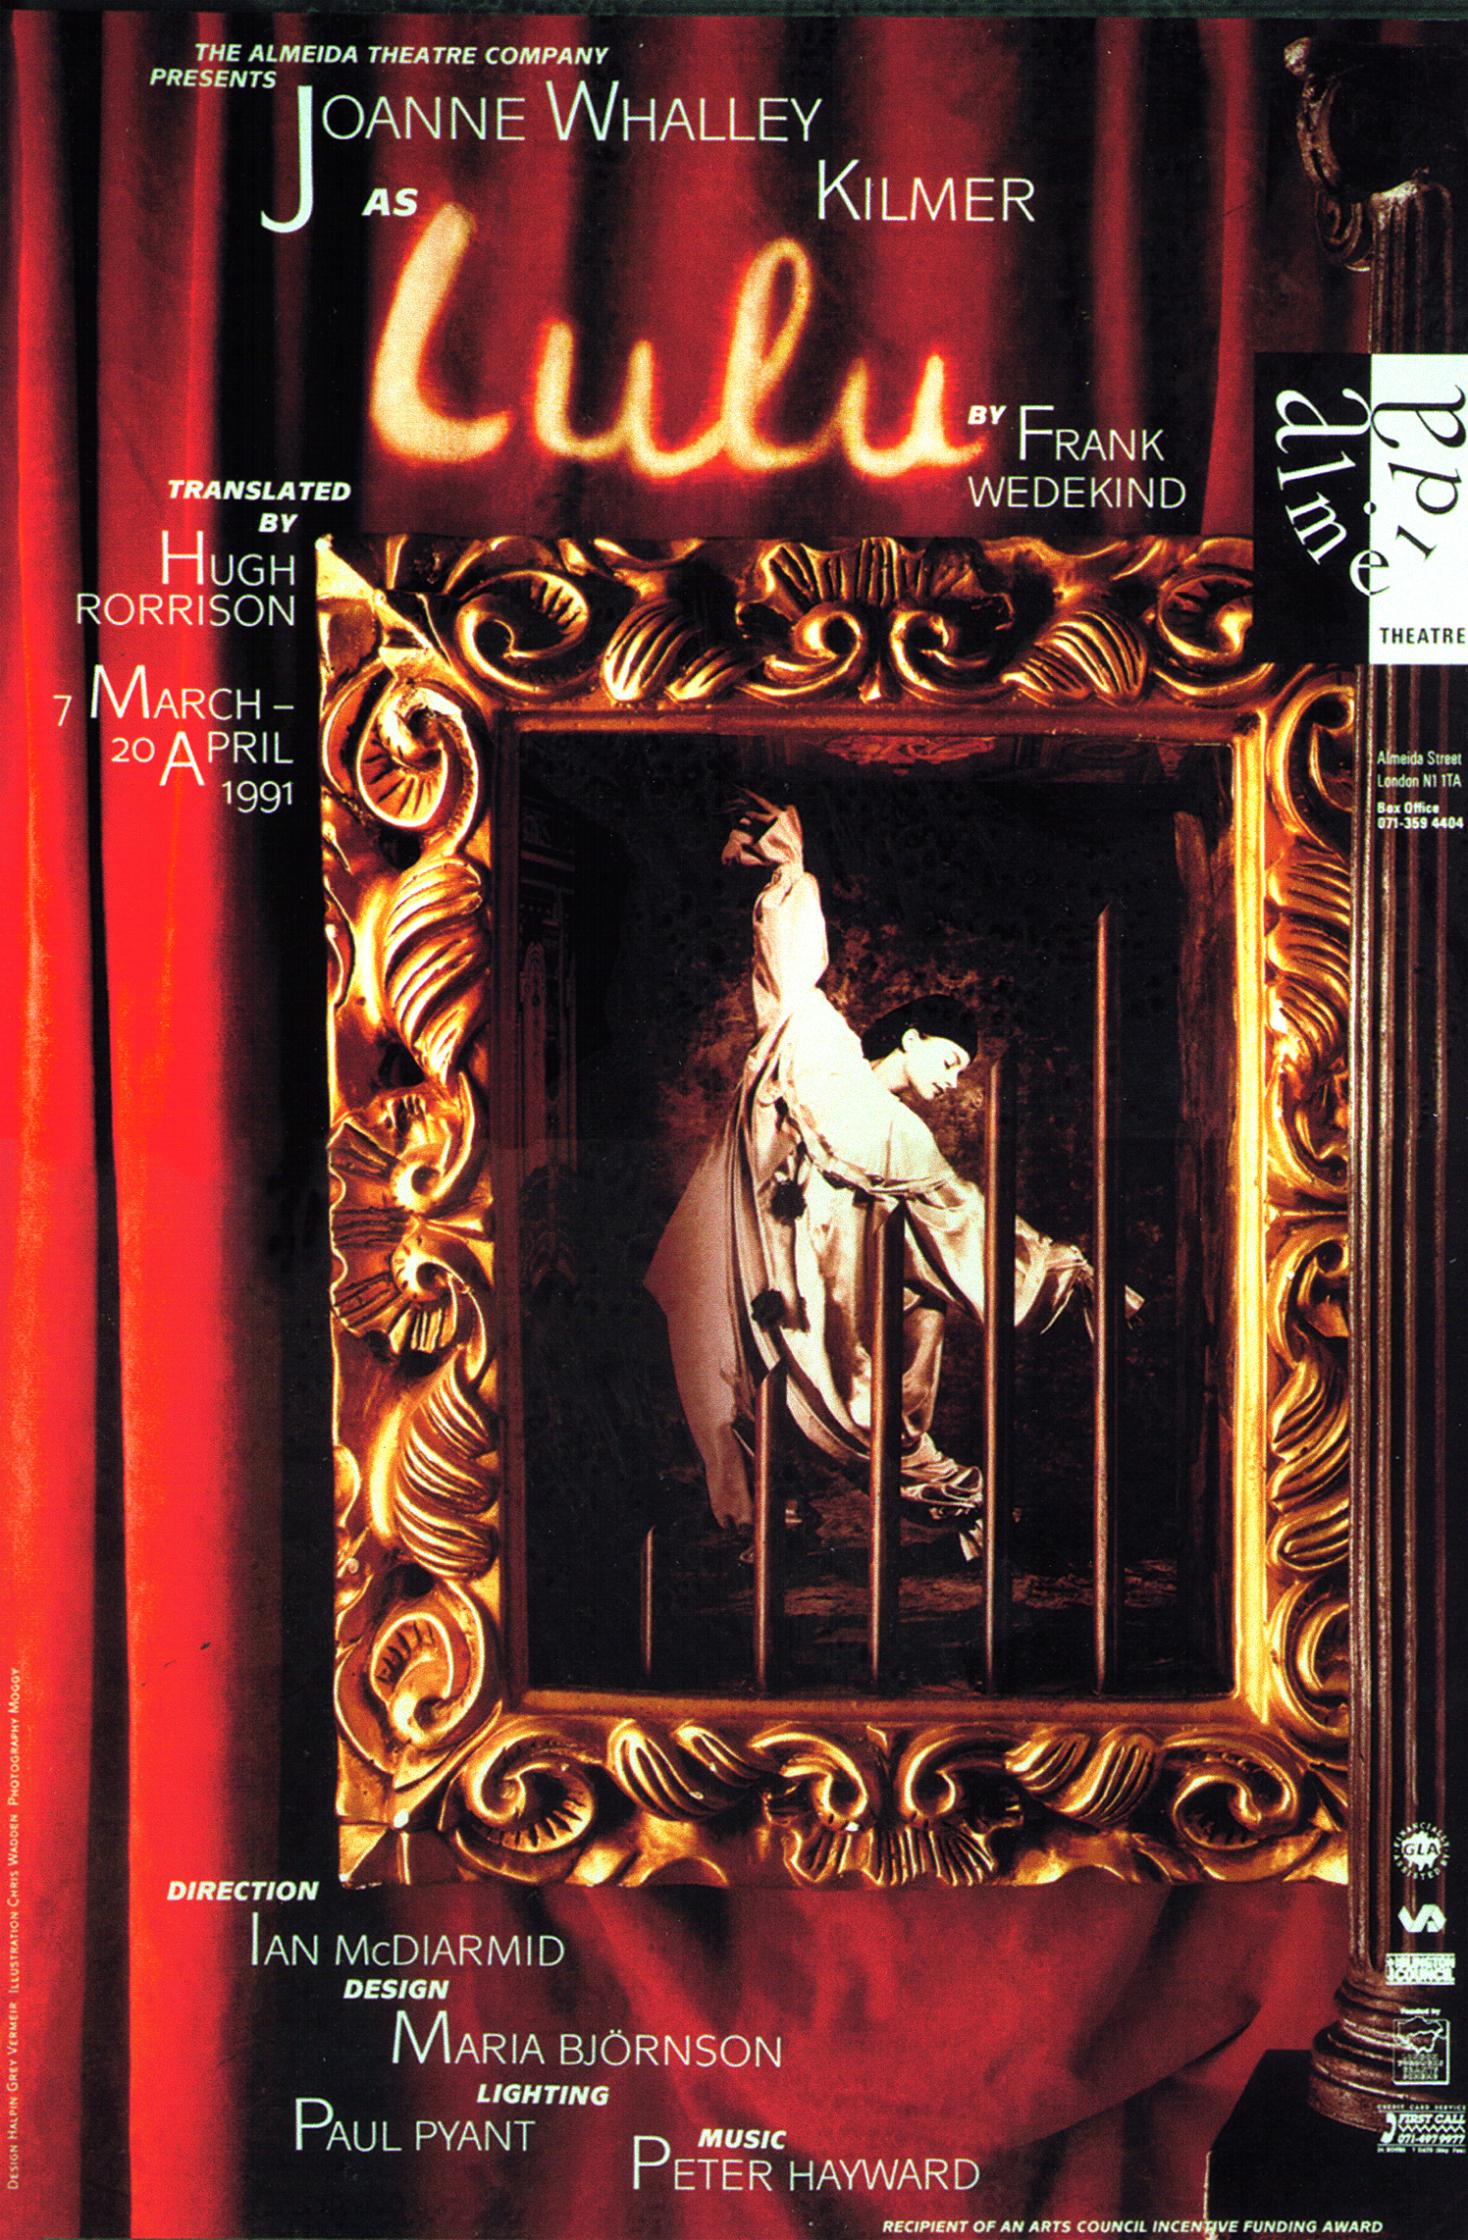 Lulu Poster / Almeida Theatre